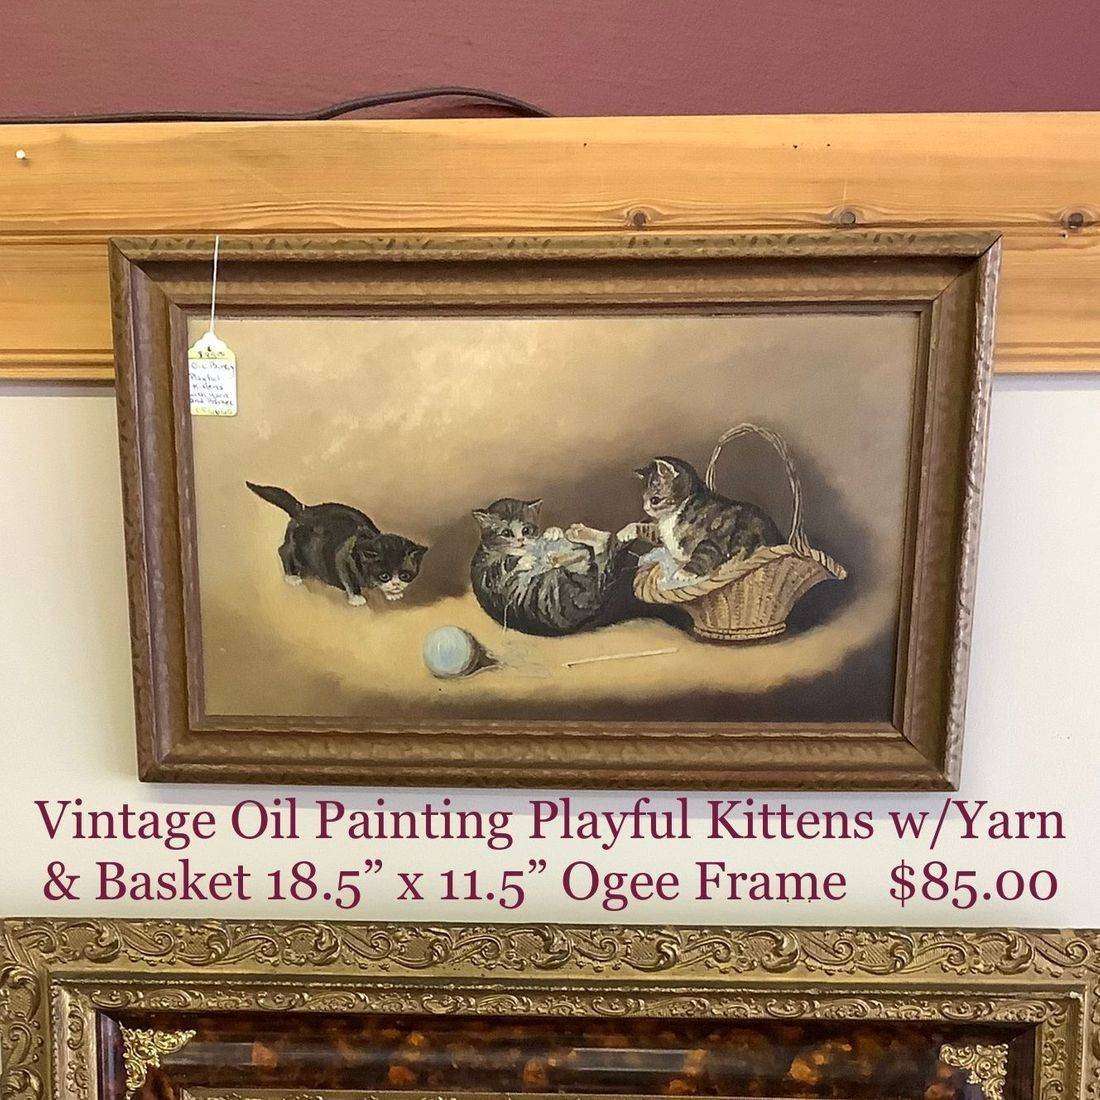 Vintage Oil Painting Playful Kittens w/Yarn & Basket in Ogee Frame   $85.00